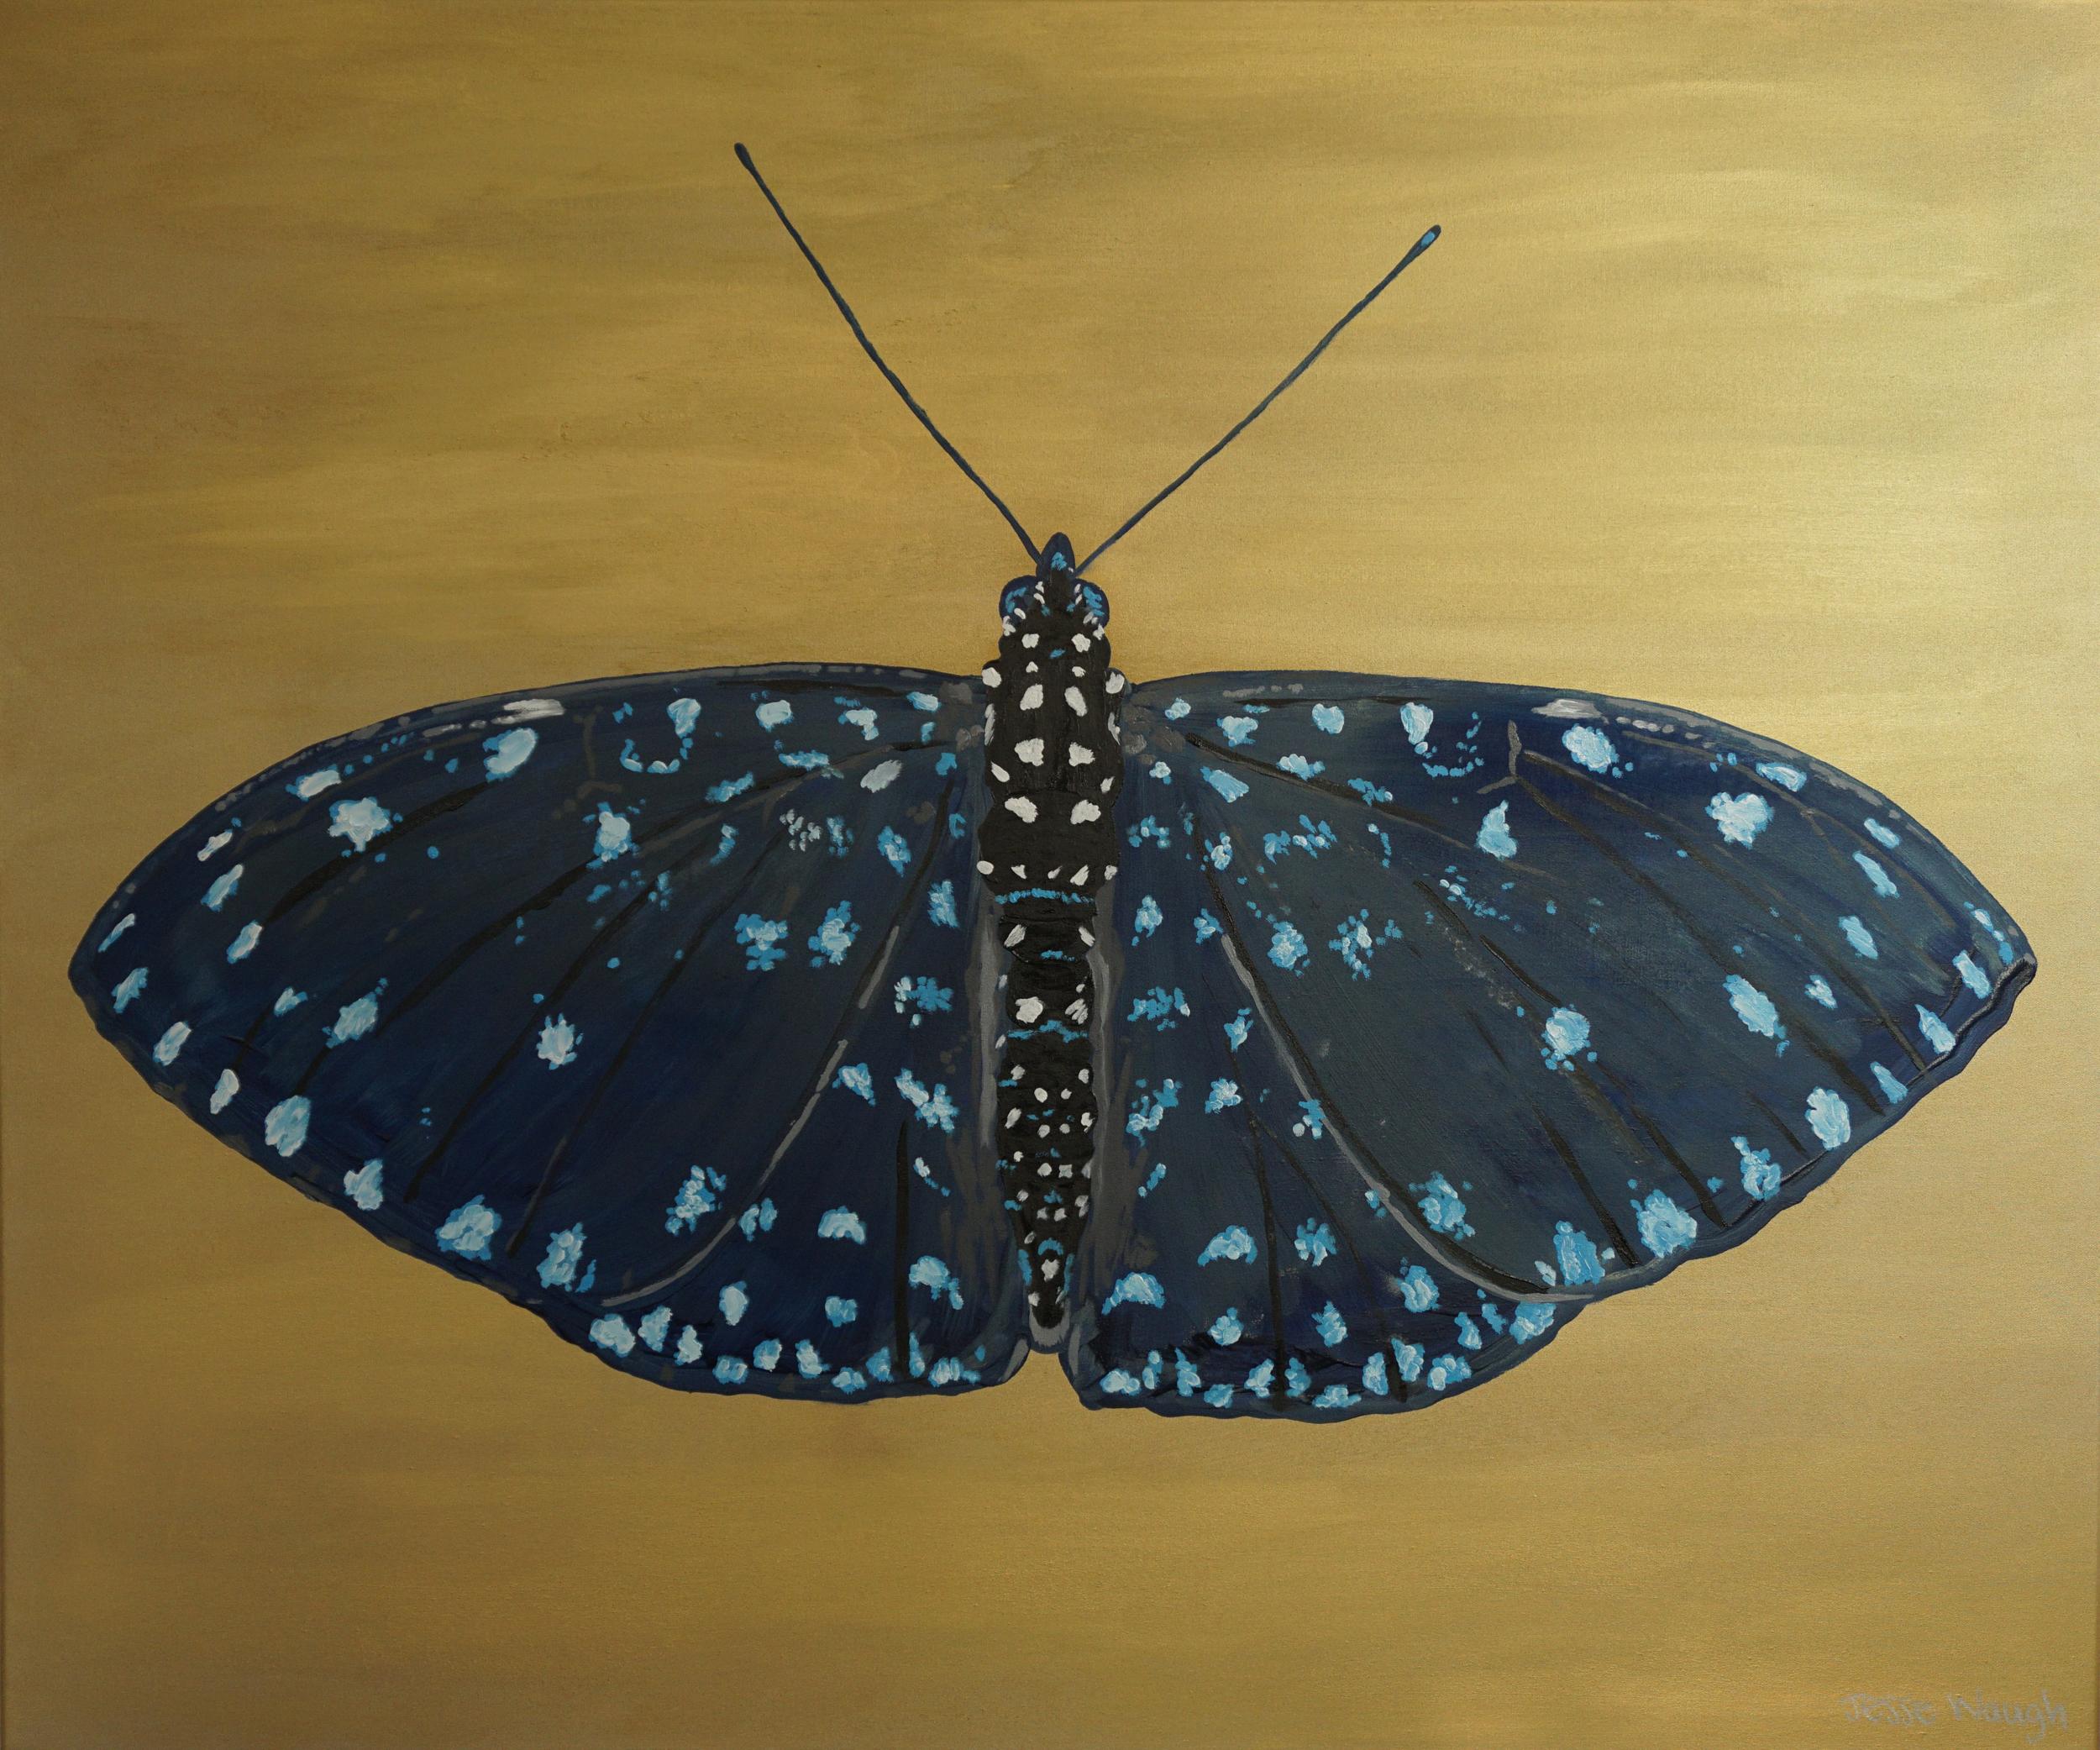 Jesse Waugh  Starry Night Cracker  (Hamadryas laodamia)   Butterfly 2 2014 Oil on canvas 100 X 120 cm